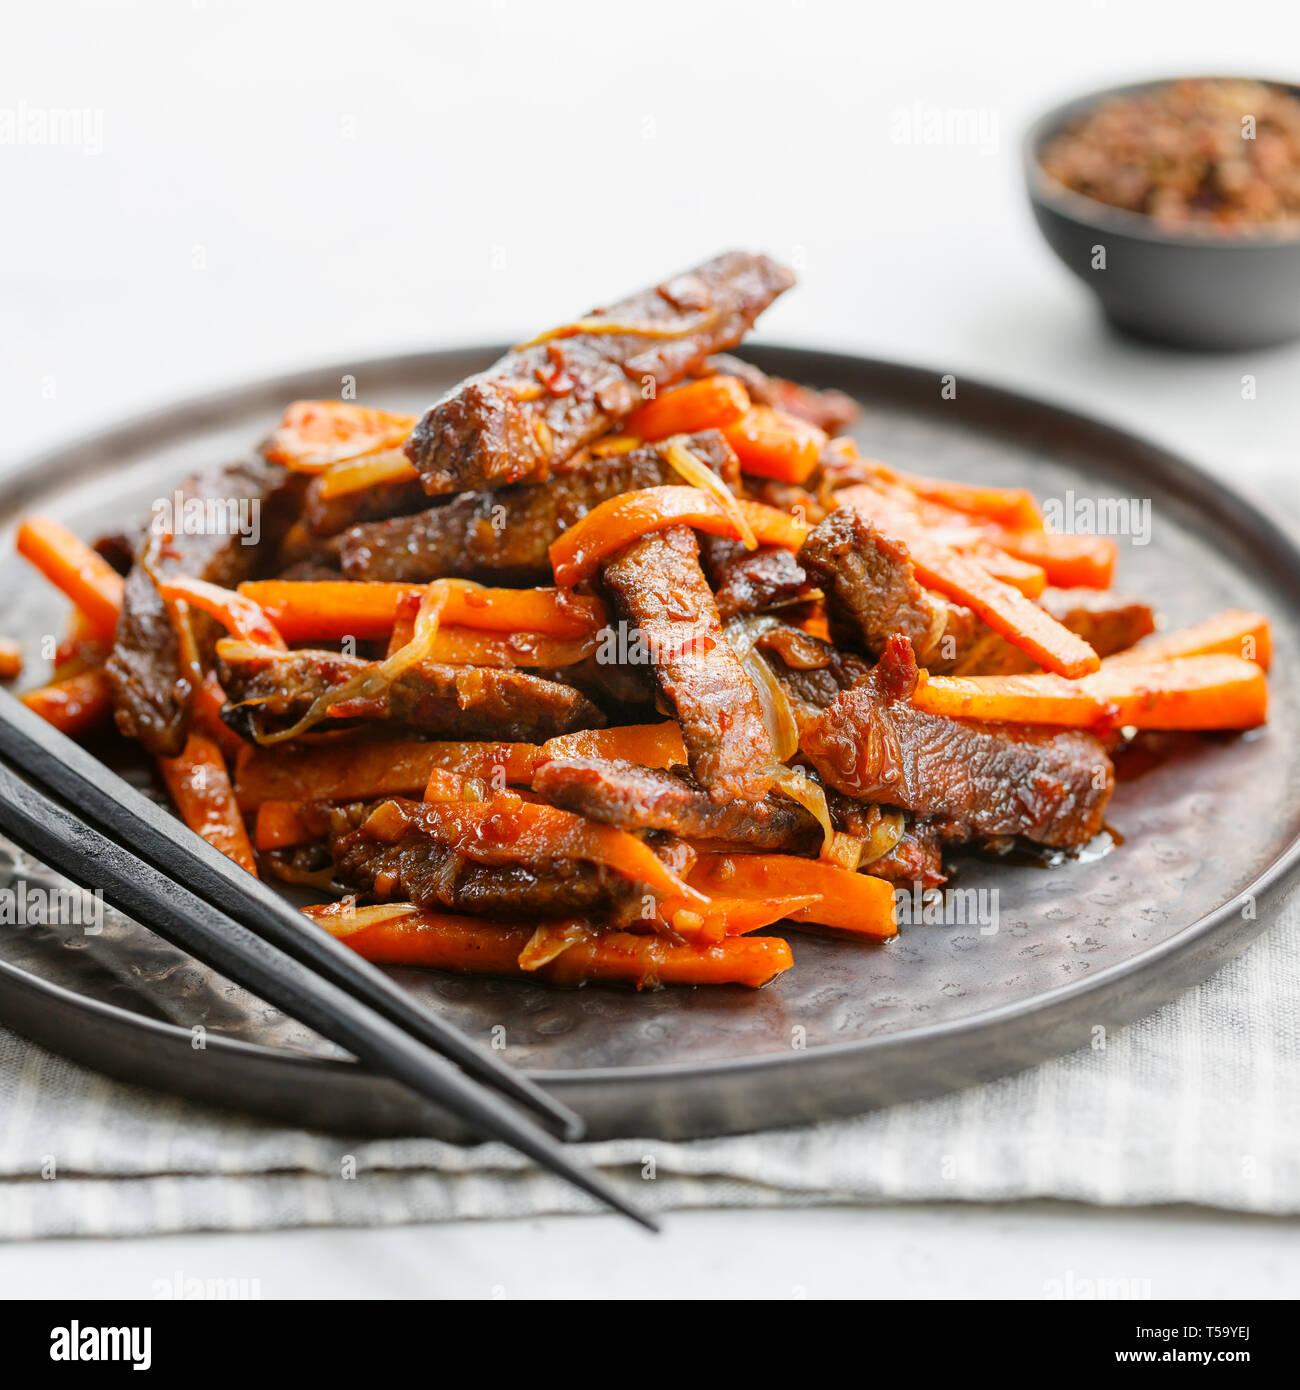 Close Up De Szechuan Picante Chino Carne Comida En Una Placa